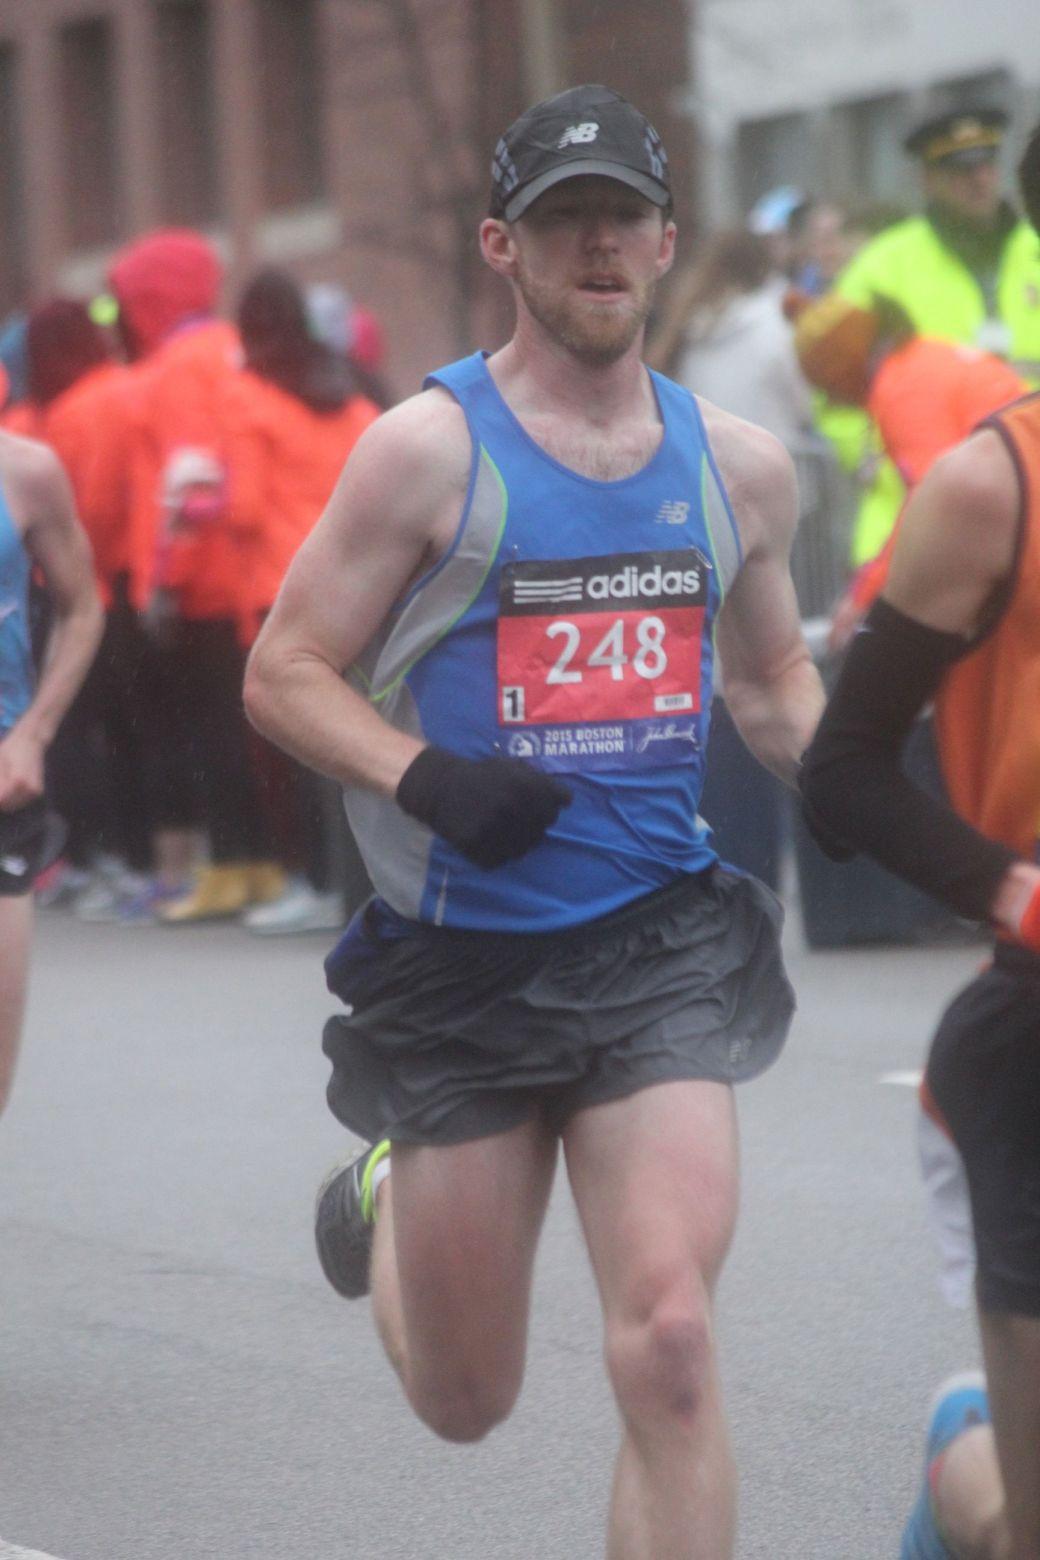 boston marathon april 20 2015 racer number 248